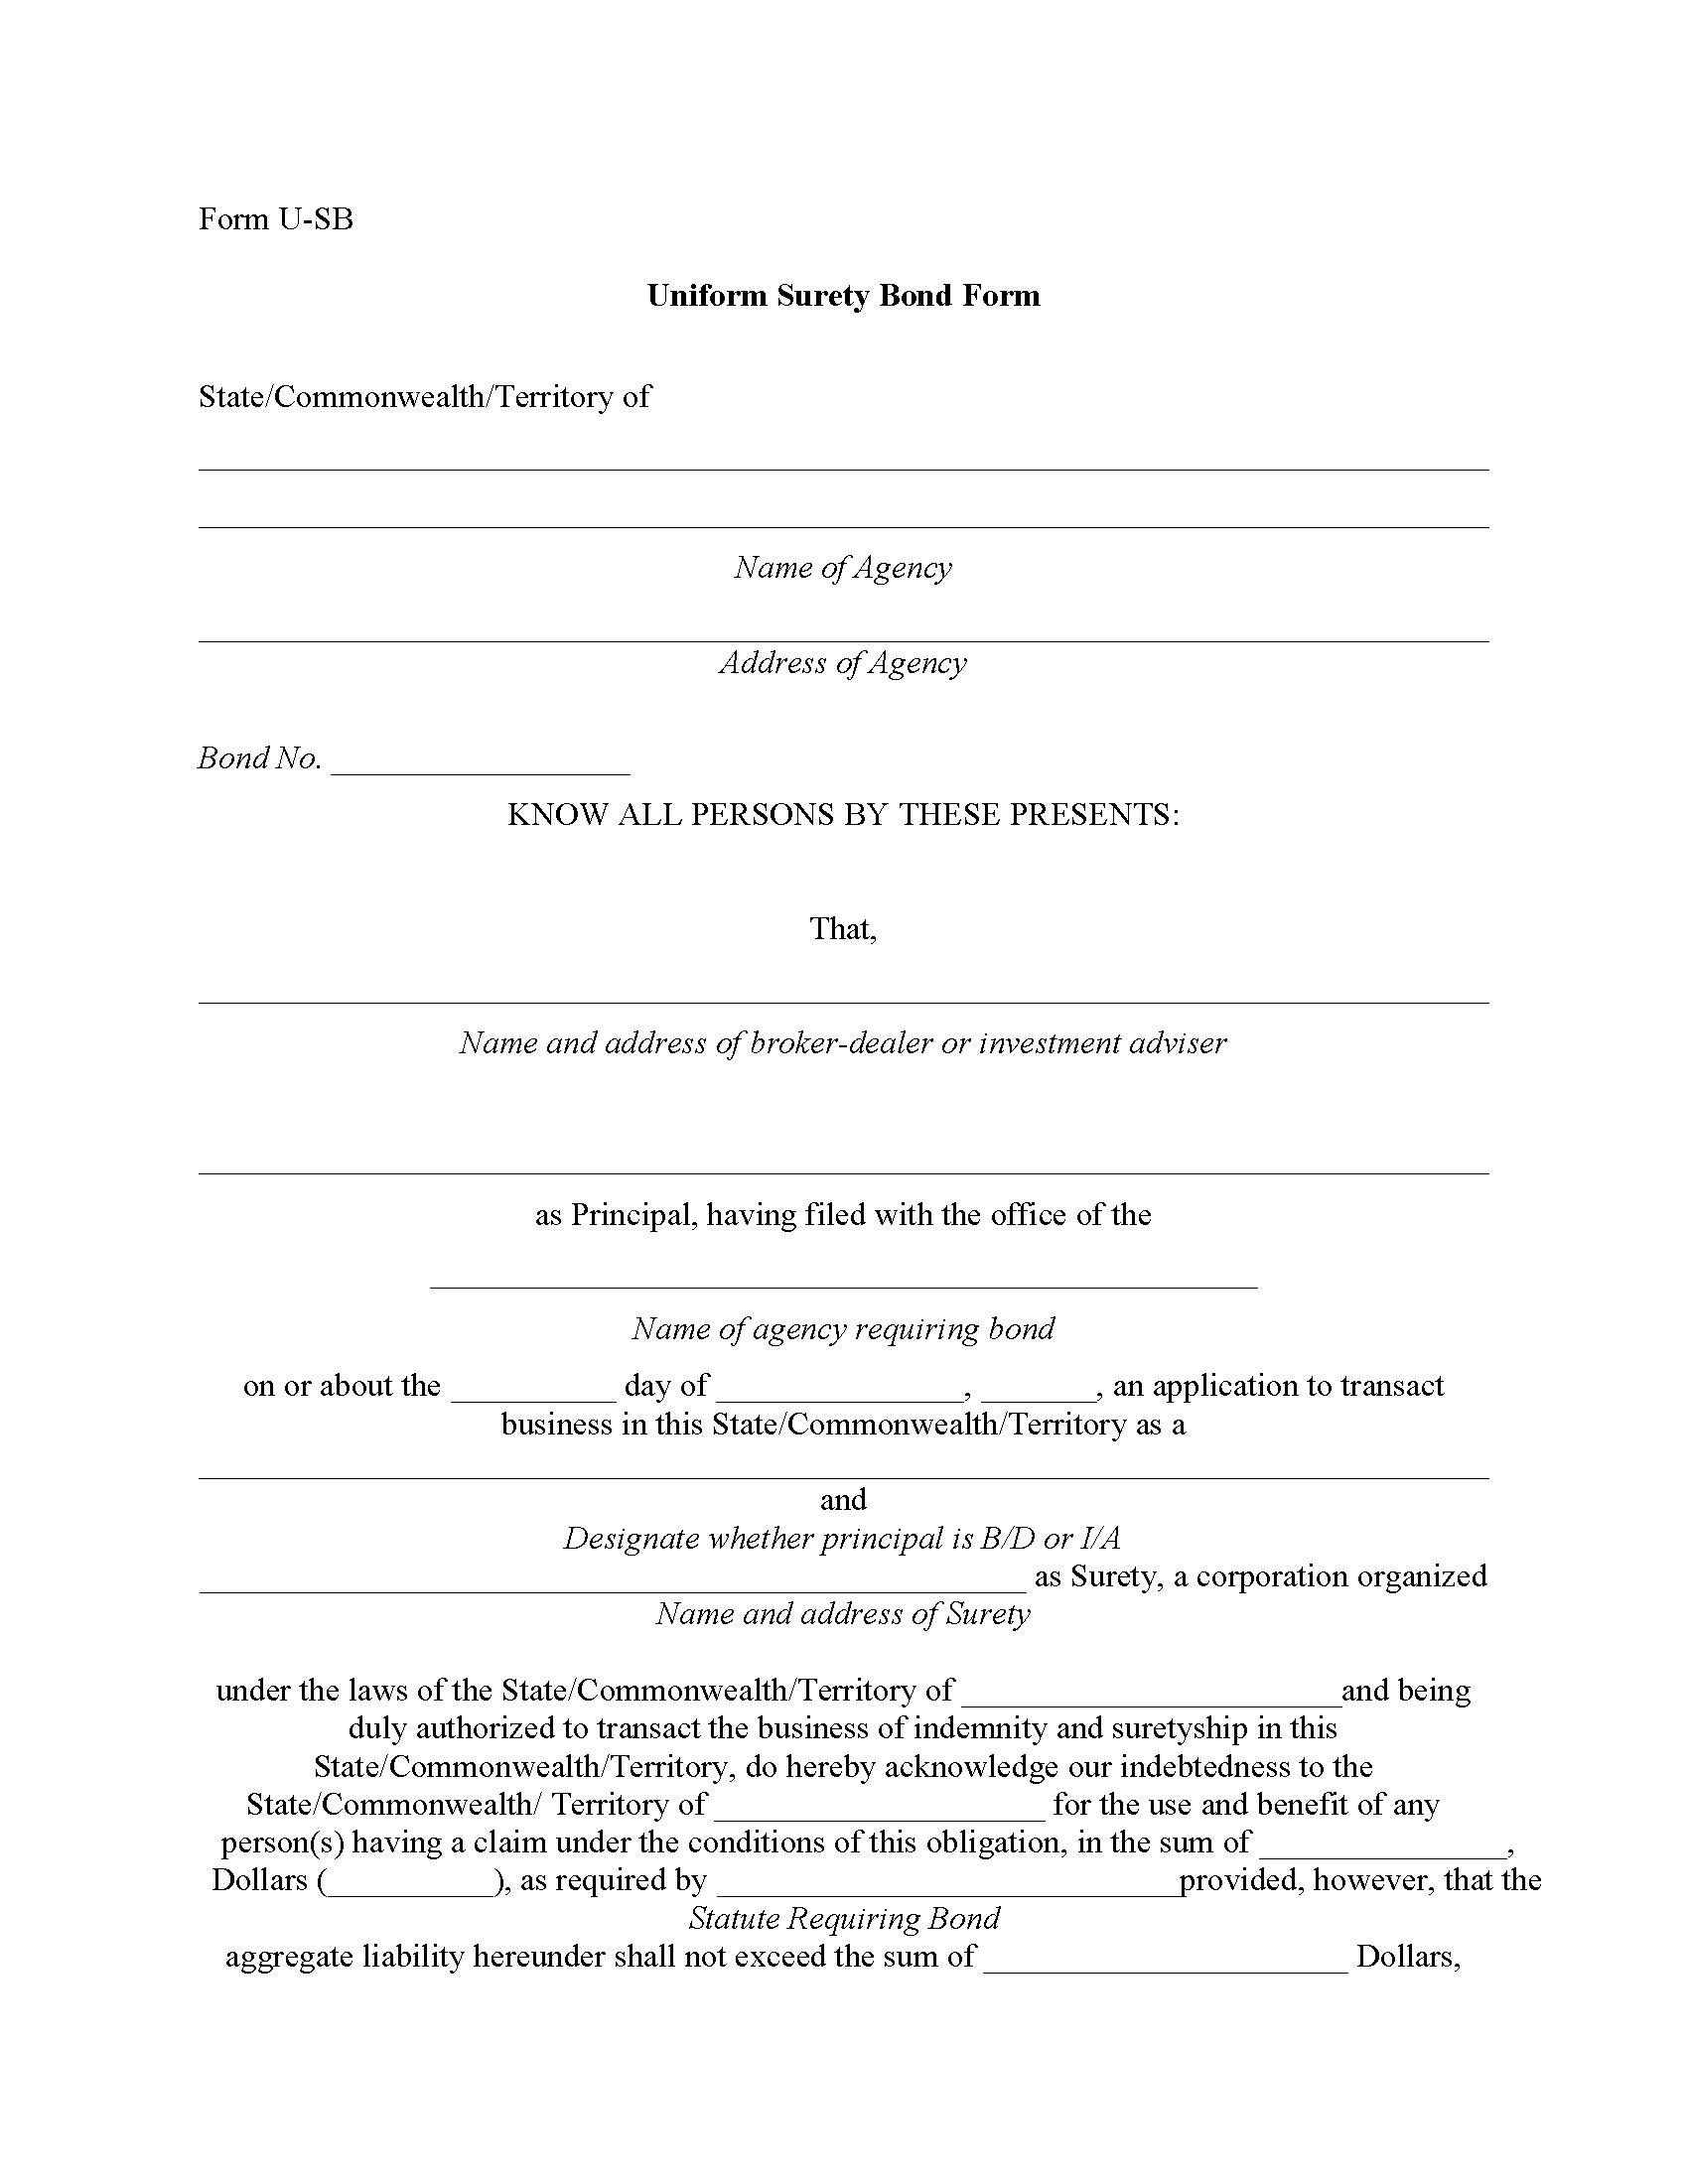 Alabama Securities Commission Investment Advisor Bond sample image